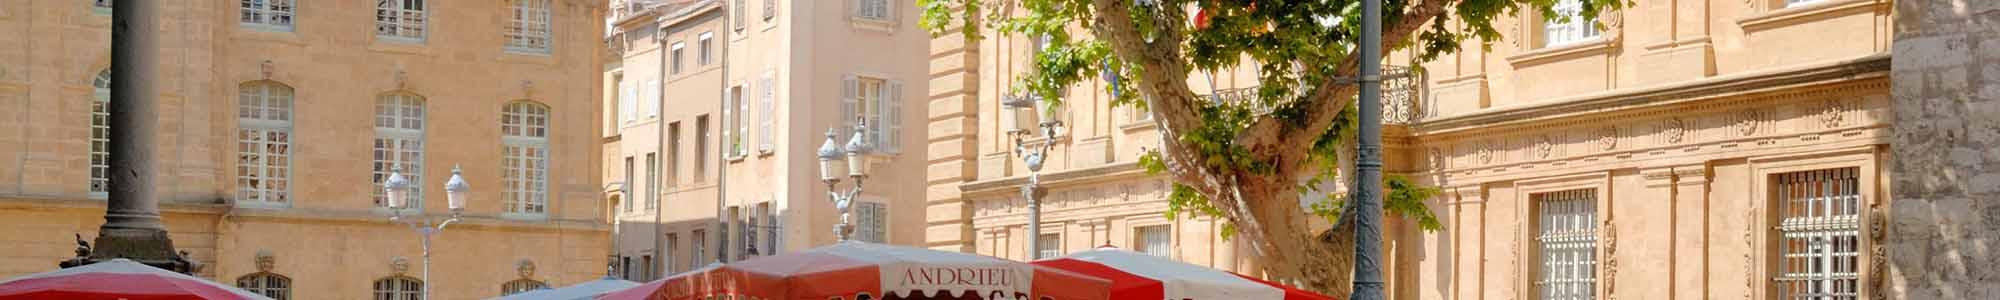 recherche emploi aix en provence